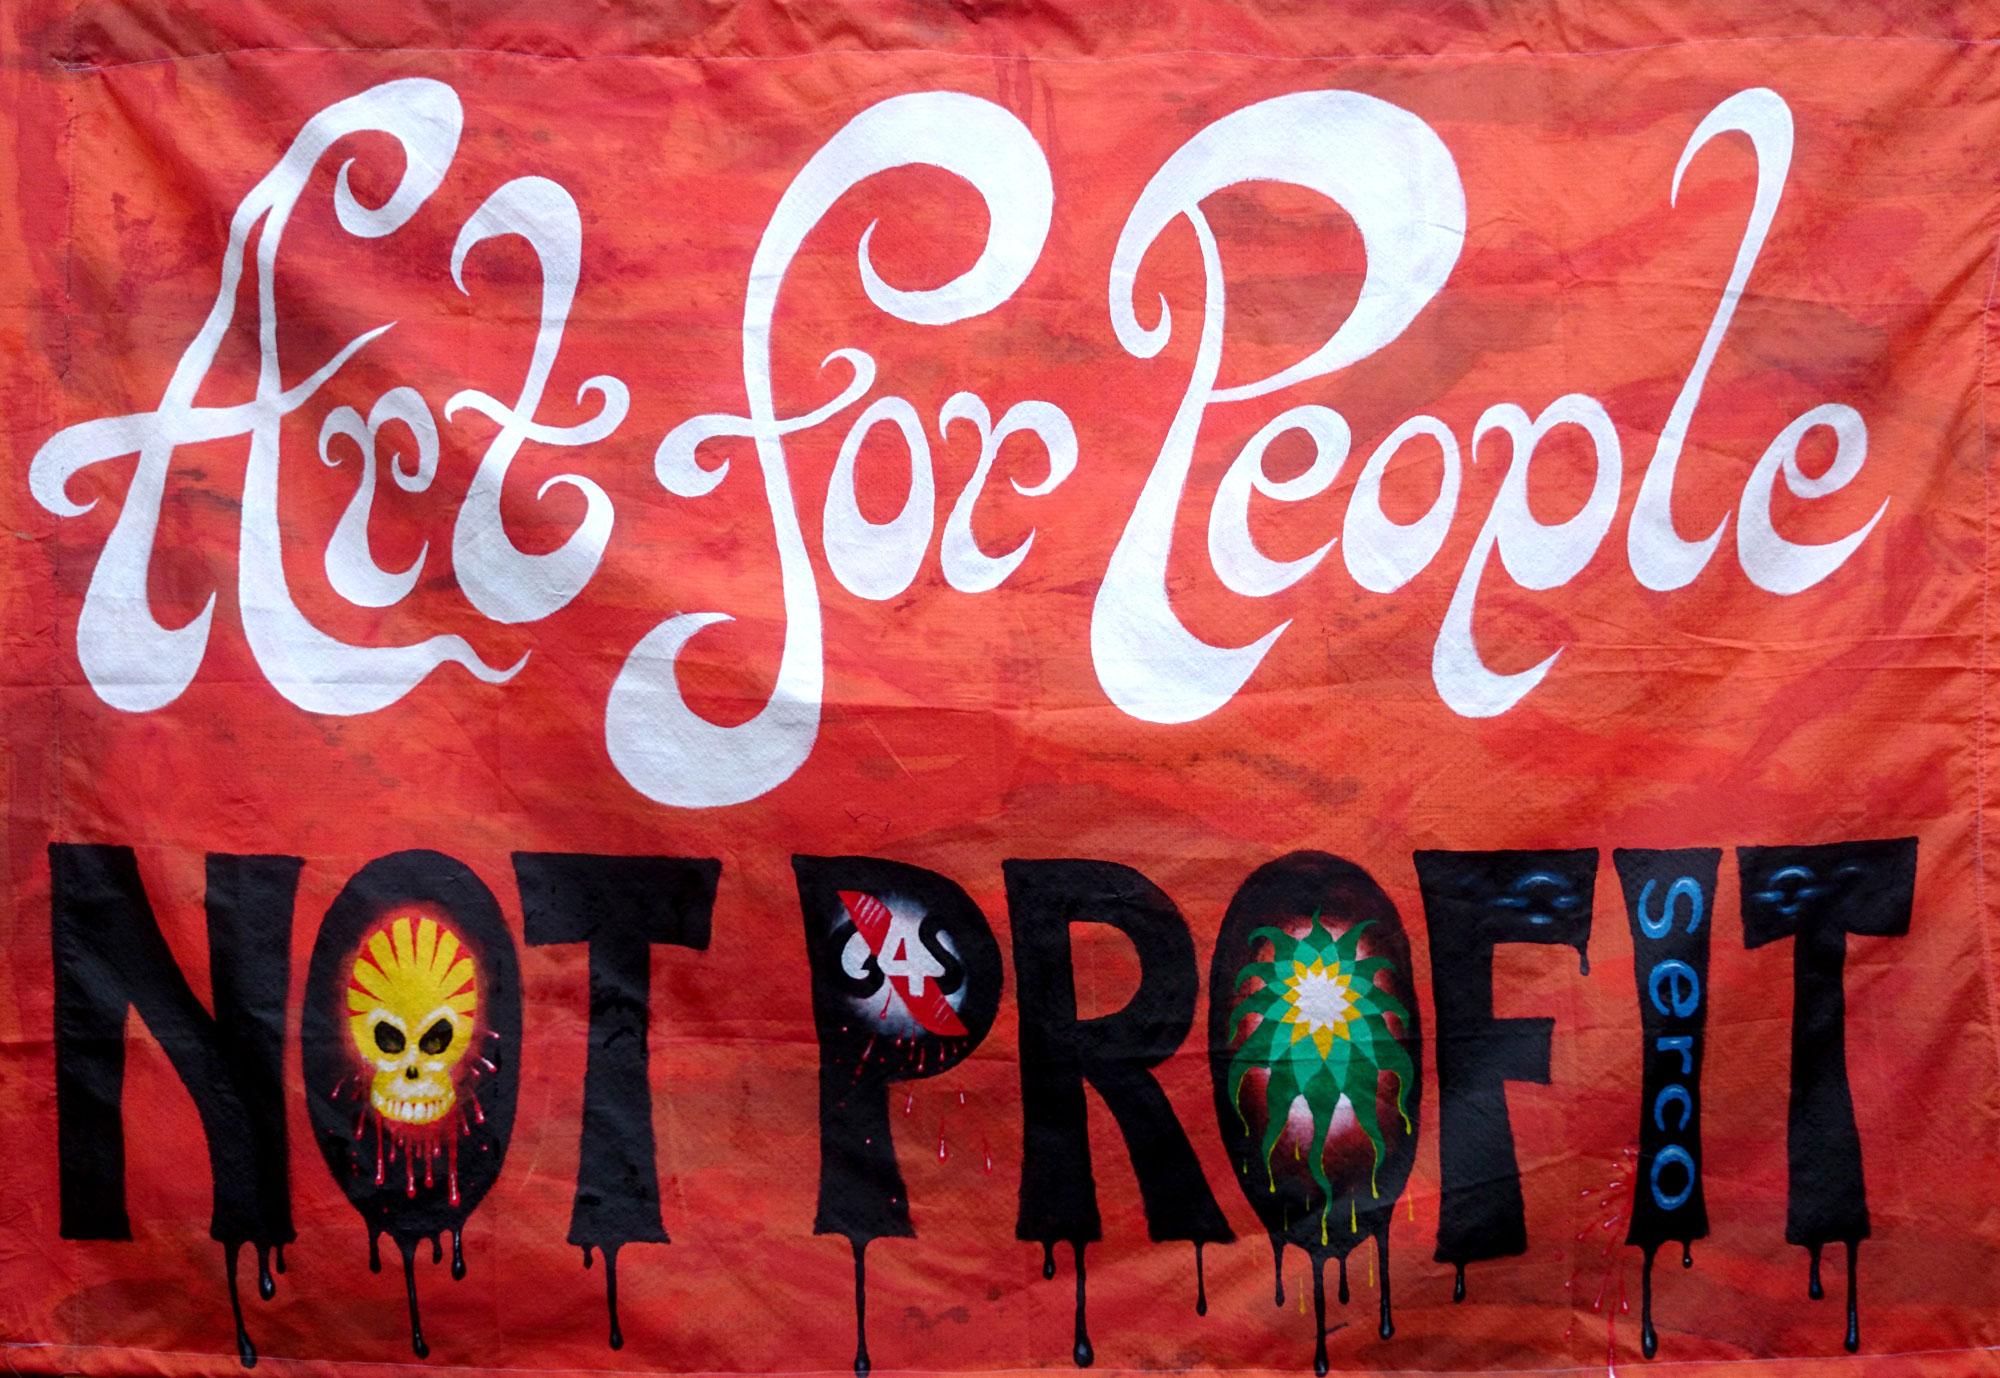 art4people_notprofit_12oct2014_by_shtiggy_webposter